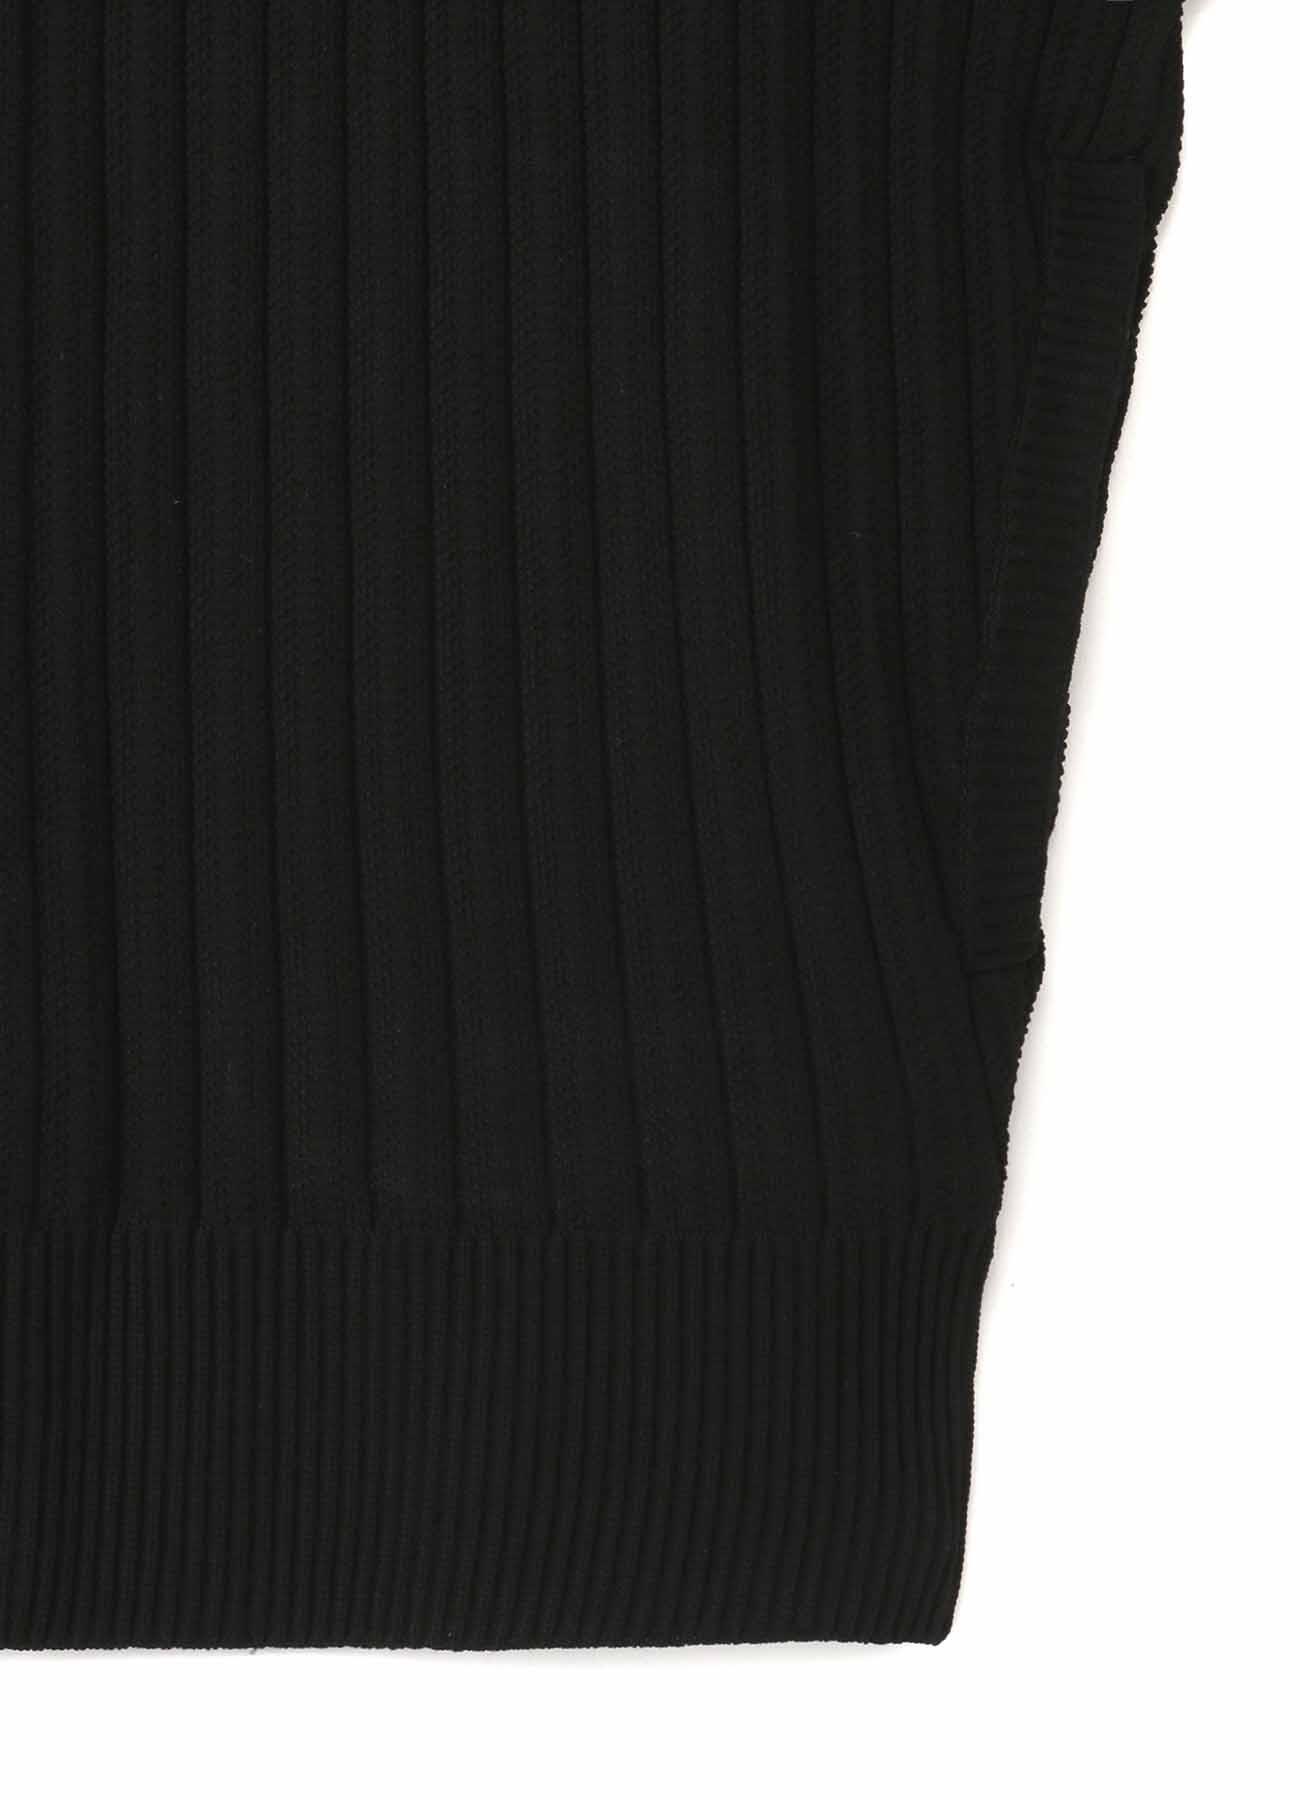 12G Spritzy Plain Stitches Drivers Knit